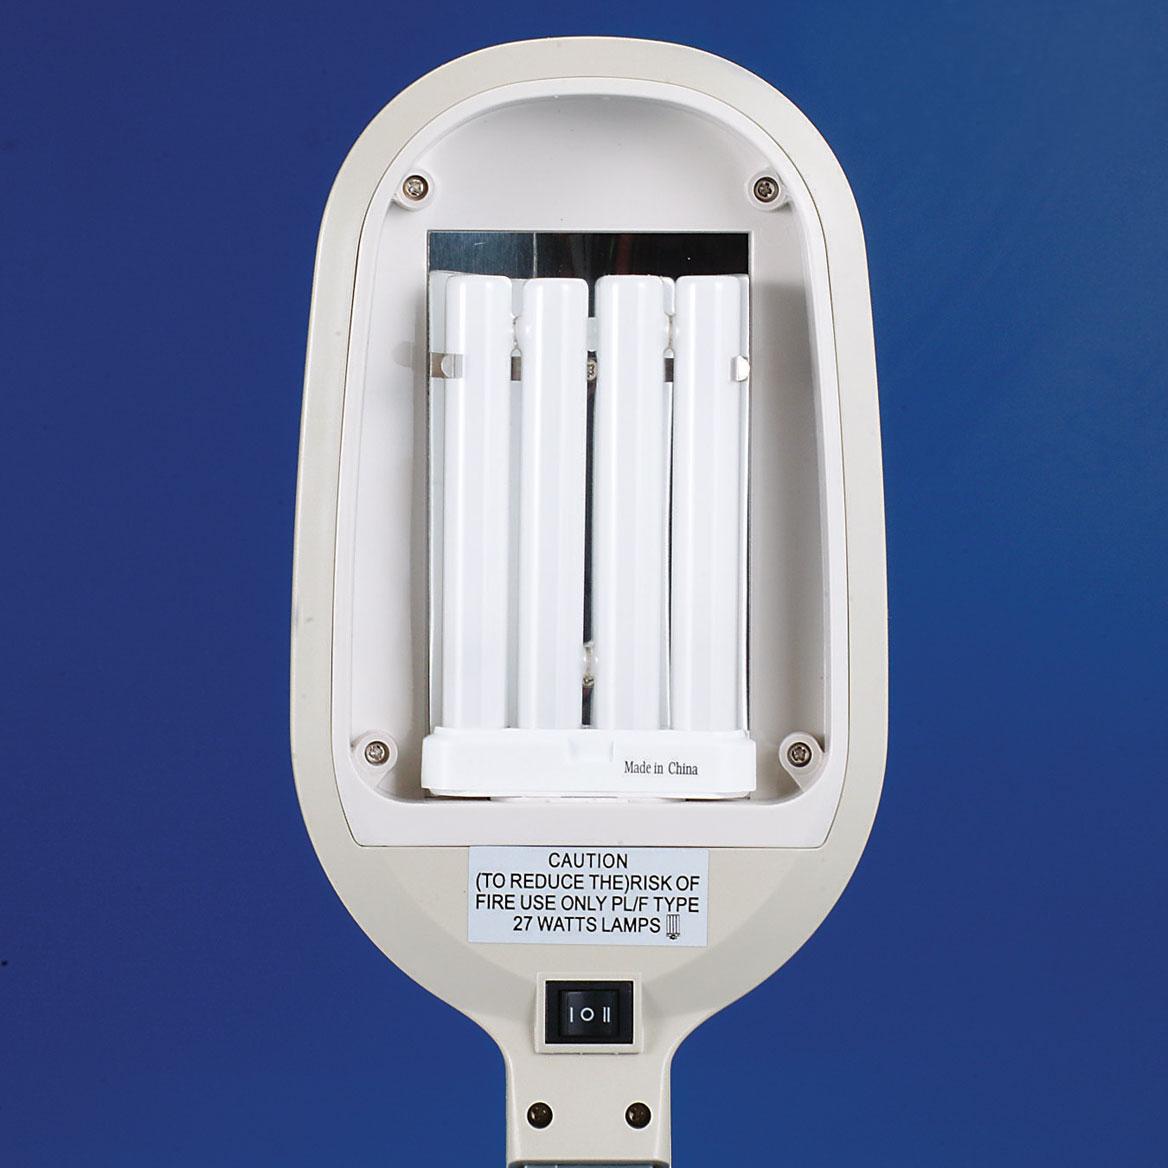 daylight floor lamp select quantity saved to wishlist save add cart description daylight floor lamp led floor lamp light sun walter drake